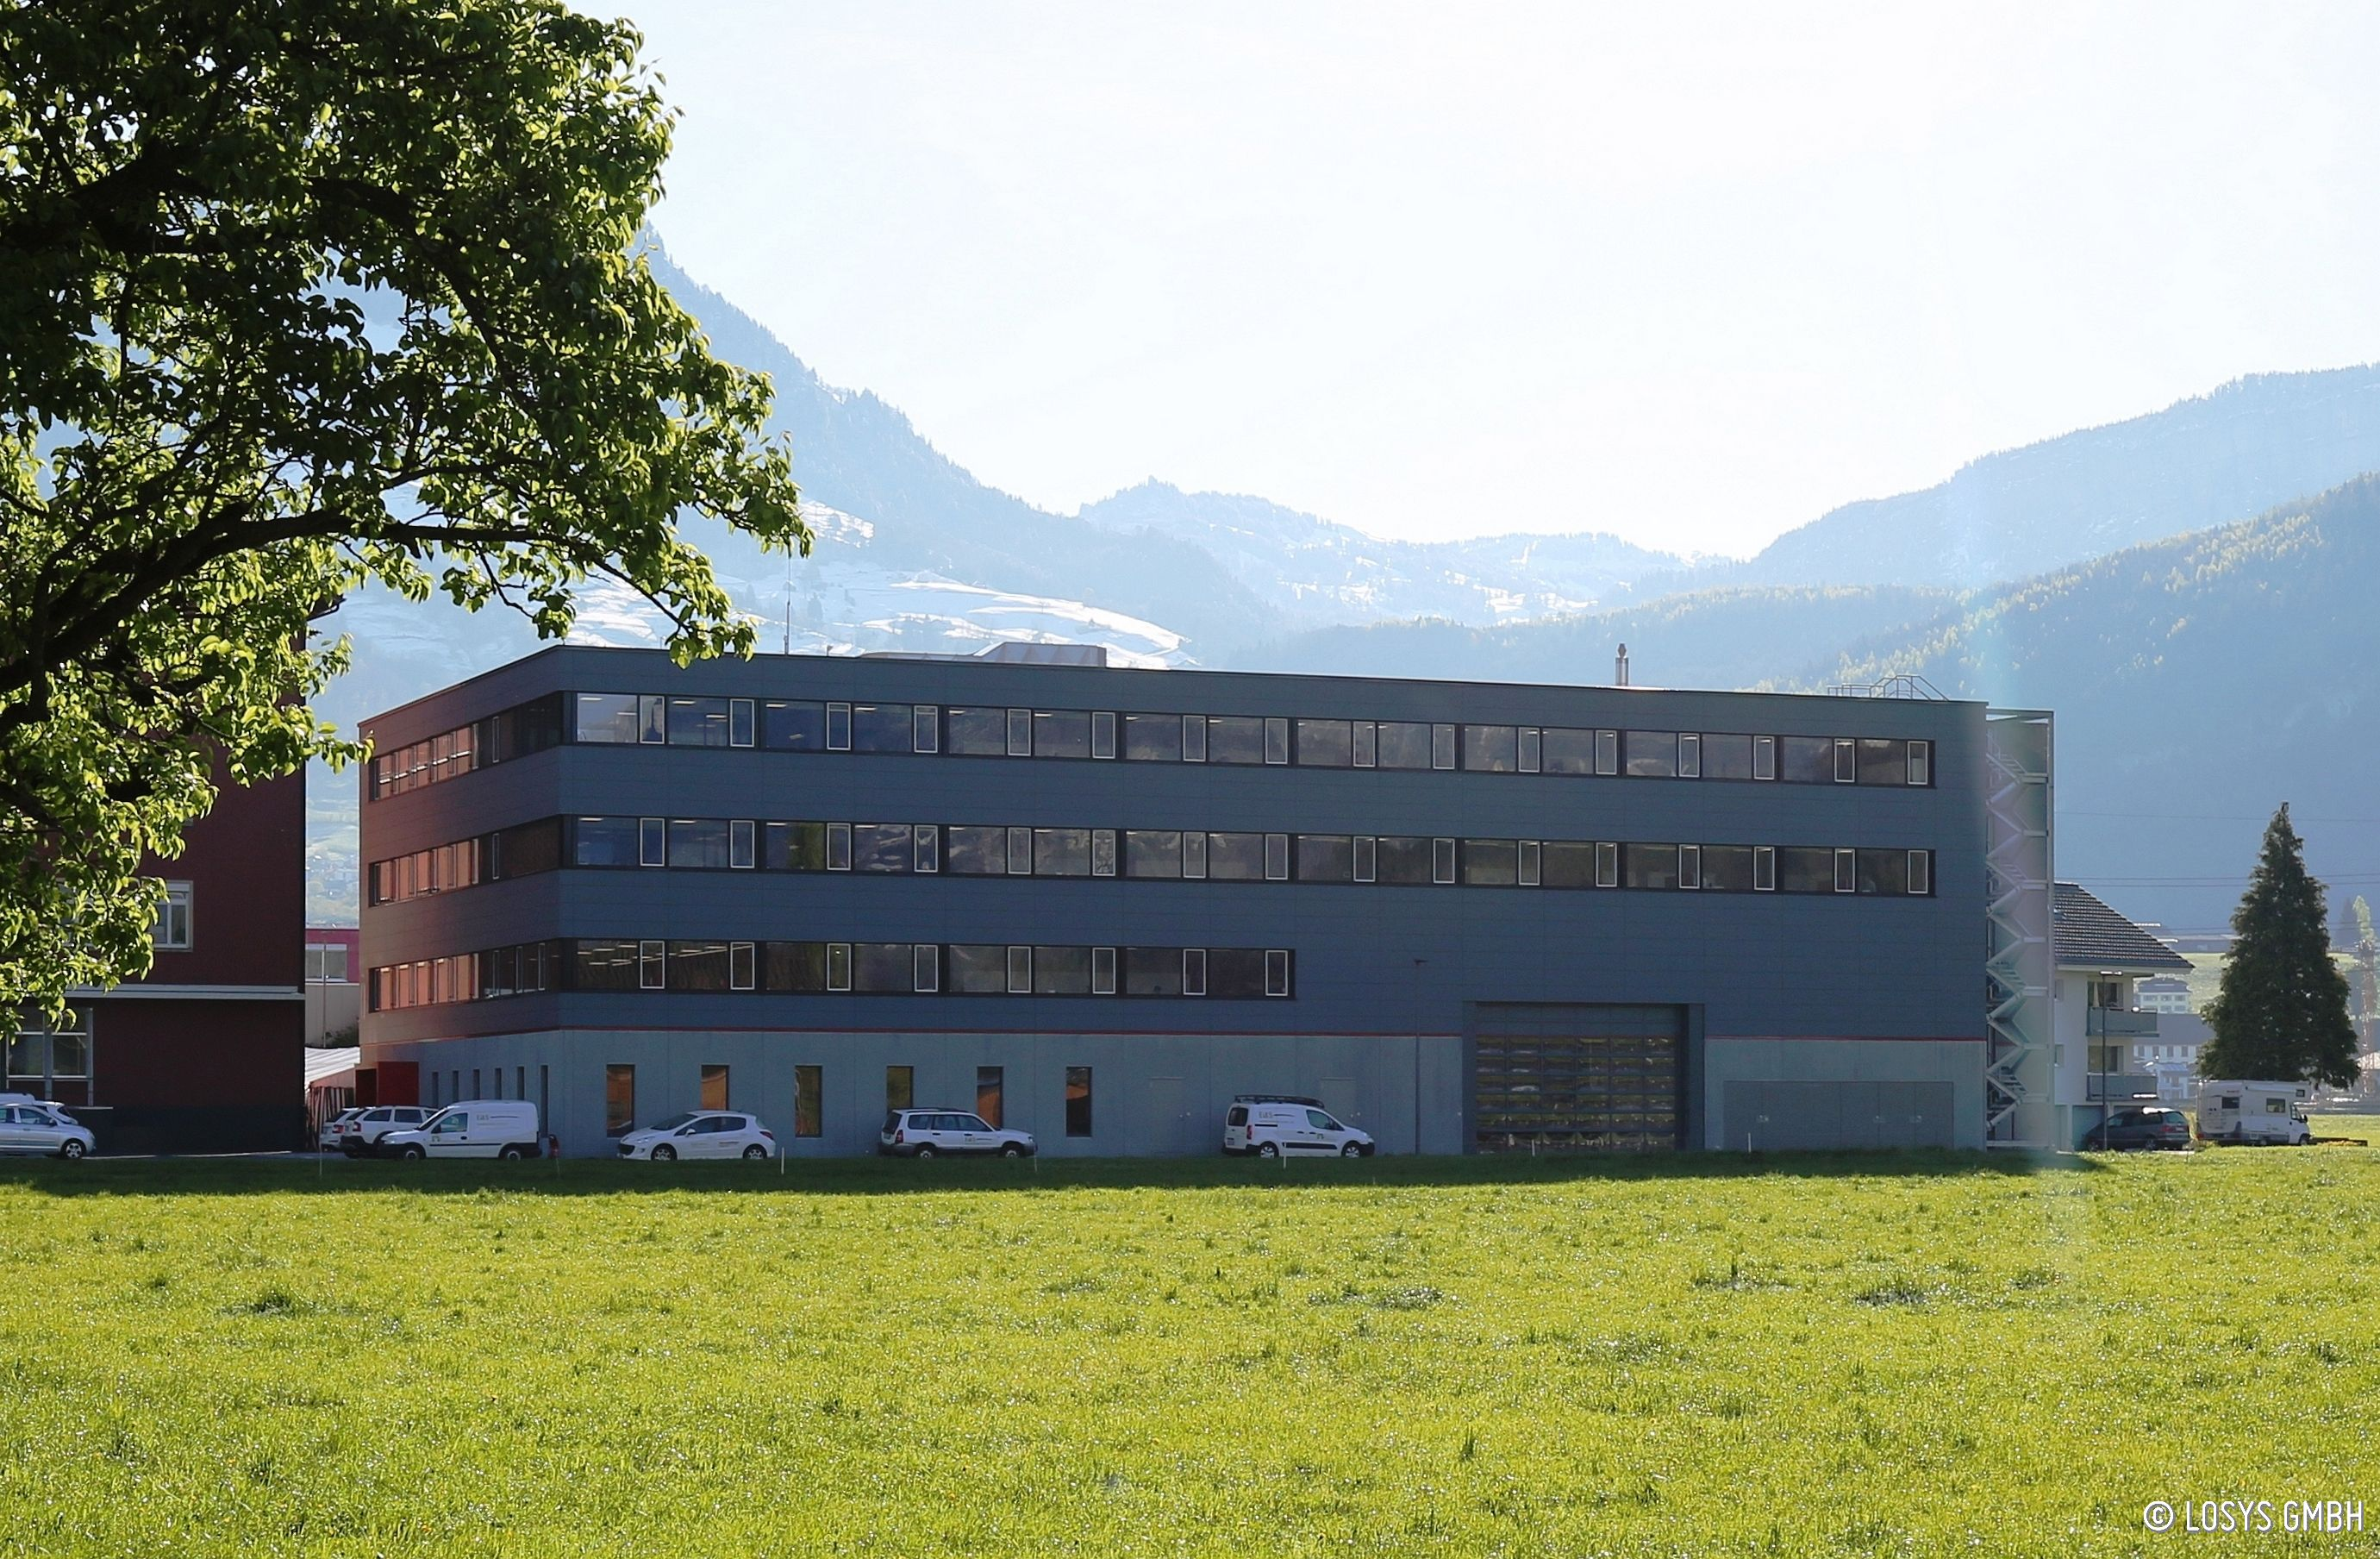 Elektrizitätswerk Schwyz AG